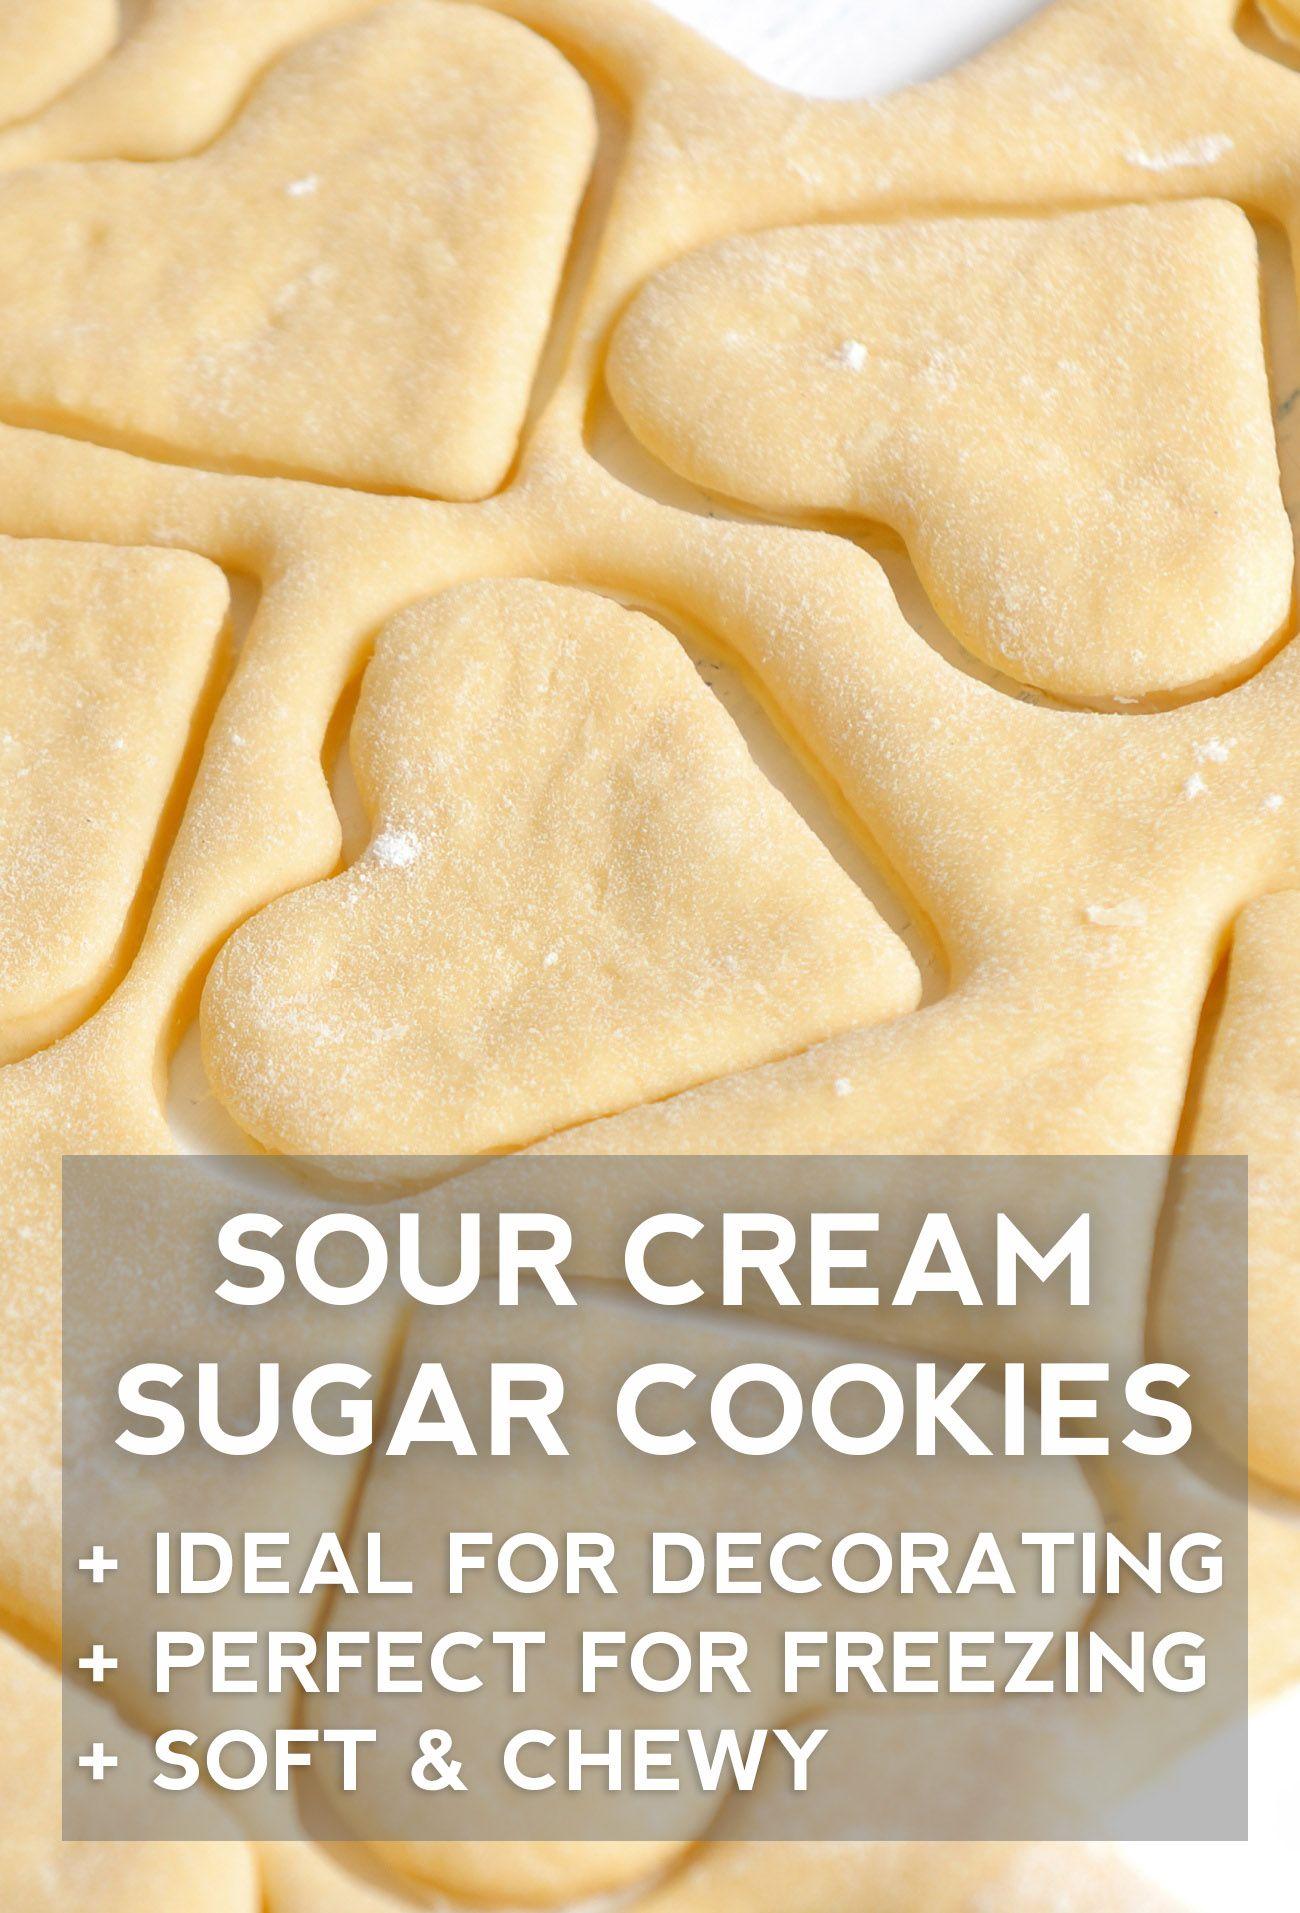 Sour Cream Sugar Cookies Recipe Sour Cream Sugar Cookies Best Christmas Cookie Recipe Cookies Recipes Christmas